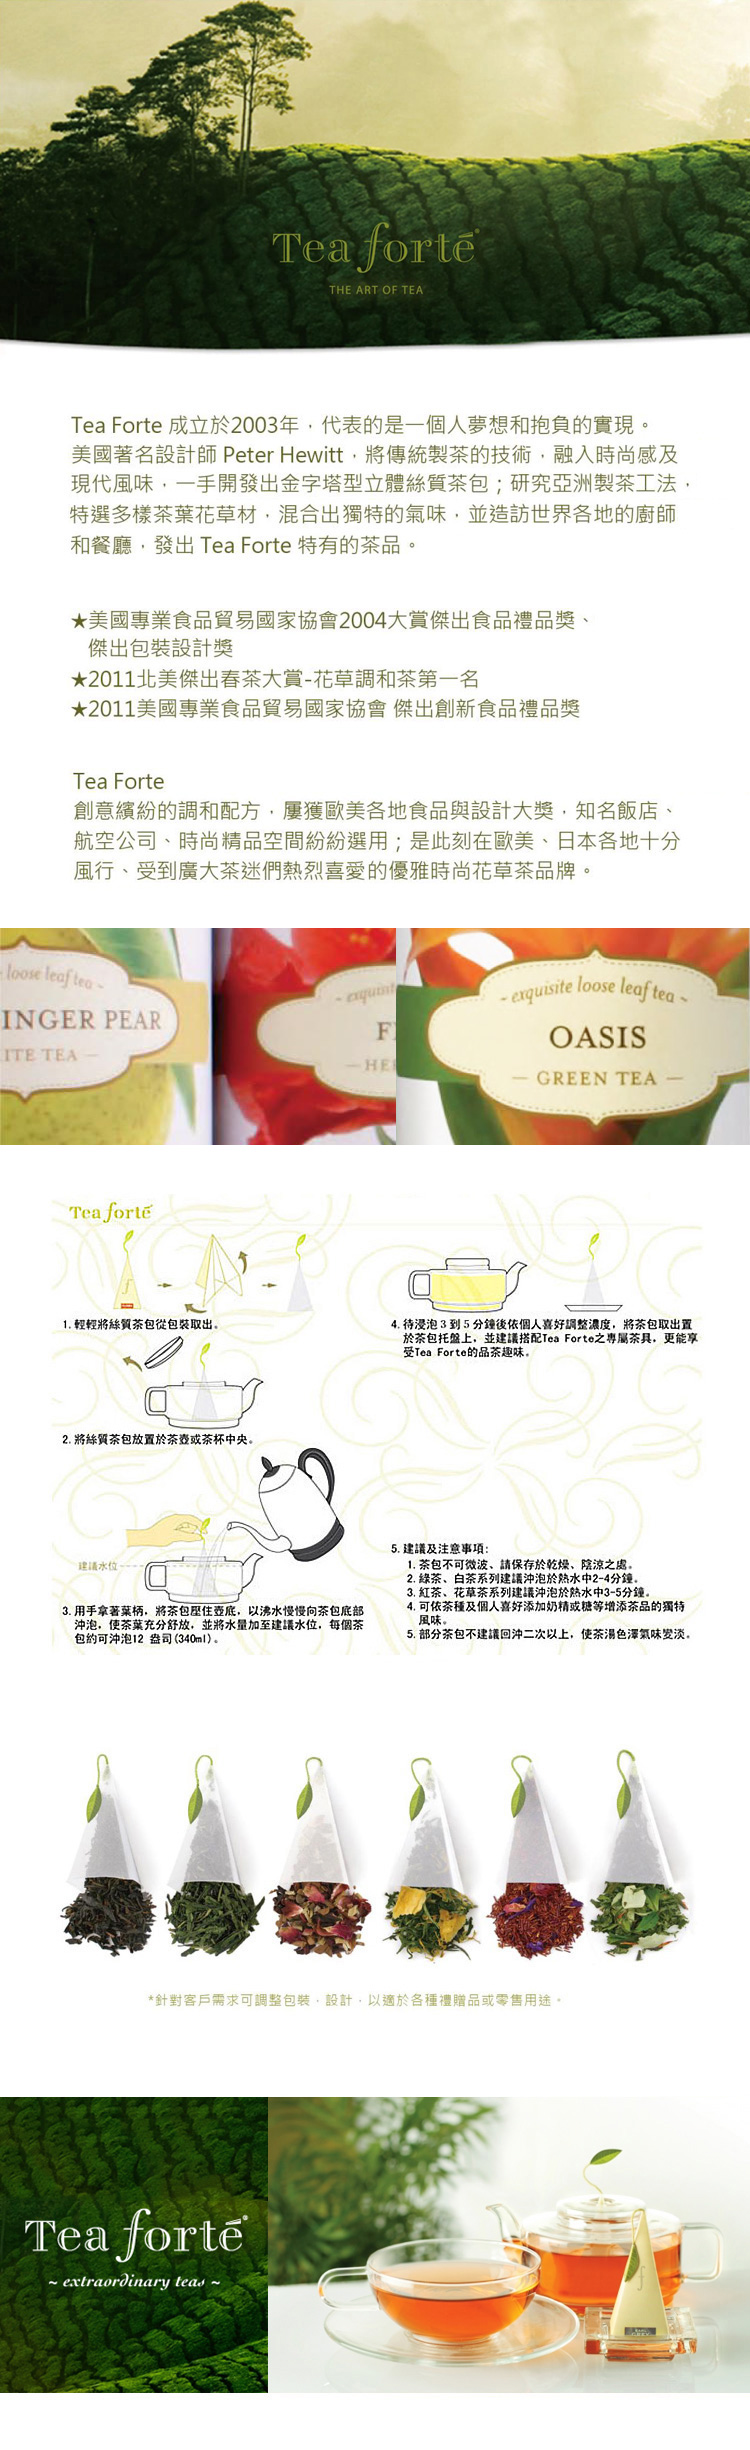 【FINAL CALL】Tea Forte 2入陶瓷方型茶托(奶油黃)